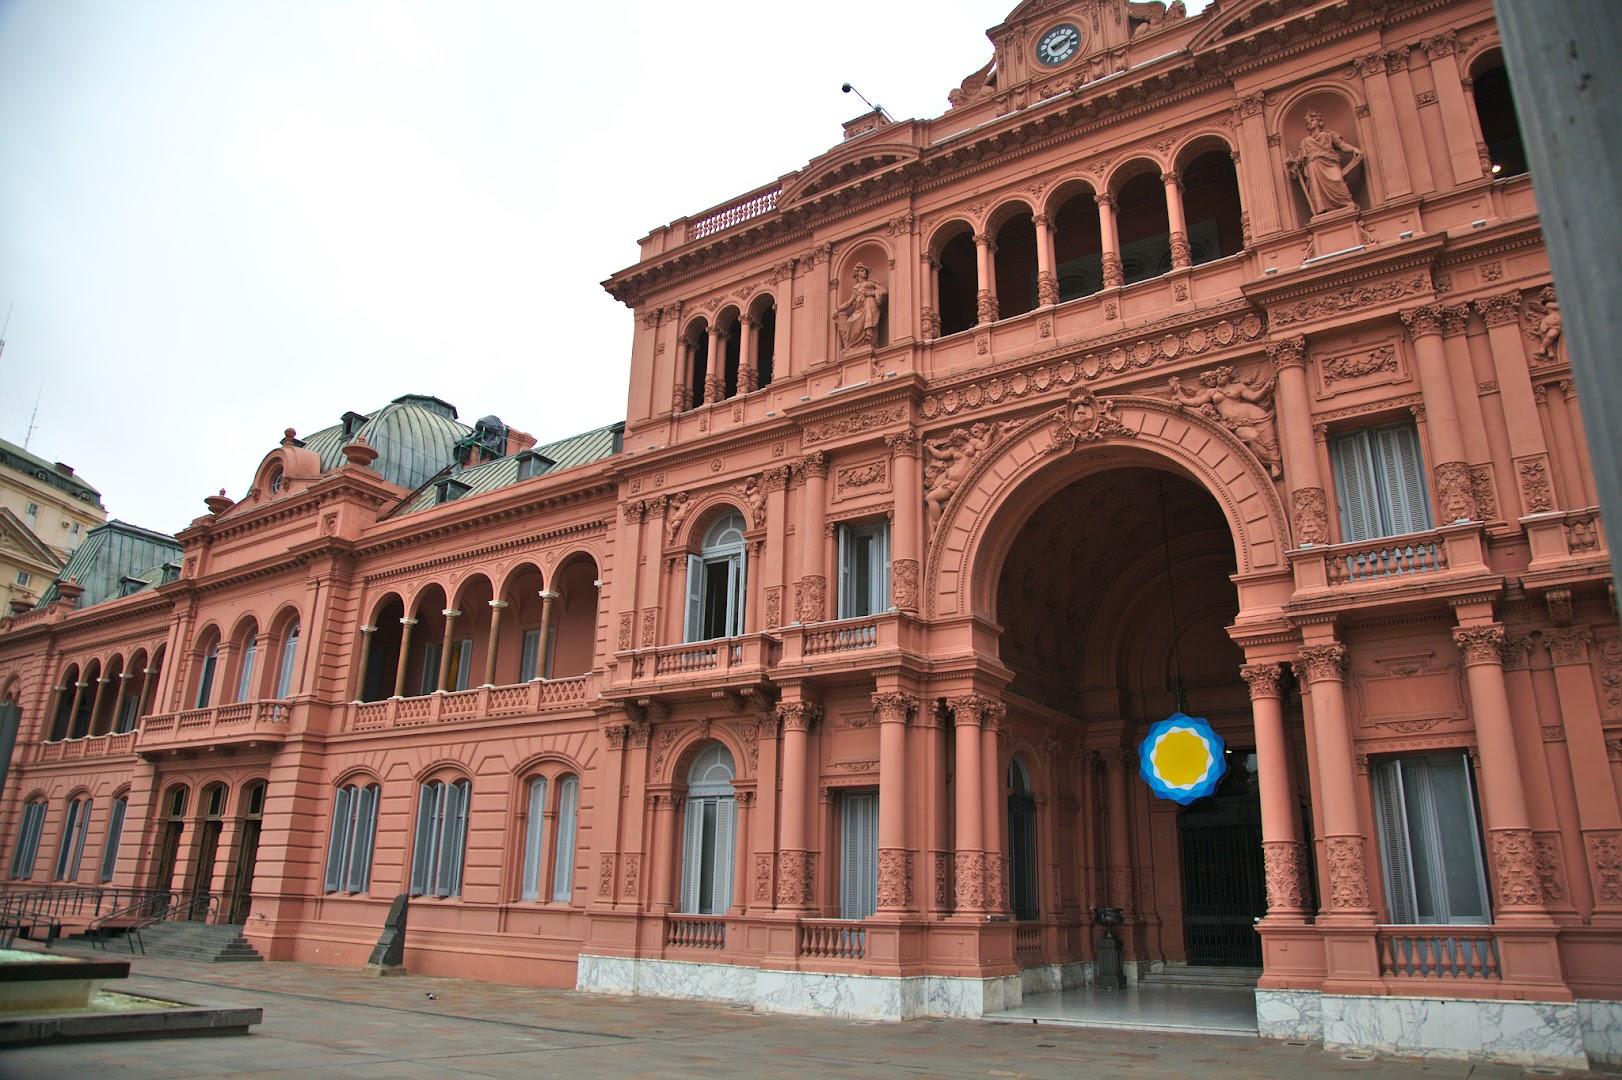 La Casa Rosada, where Evita lived